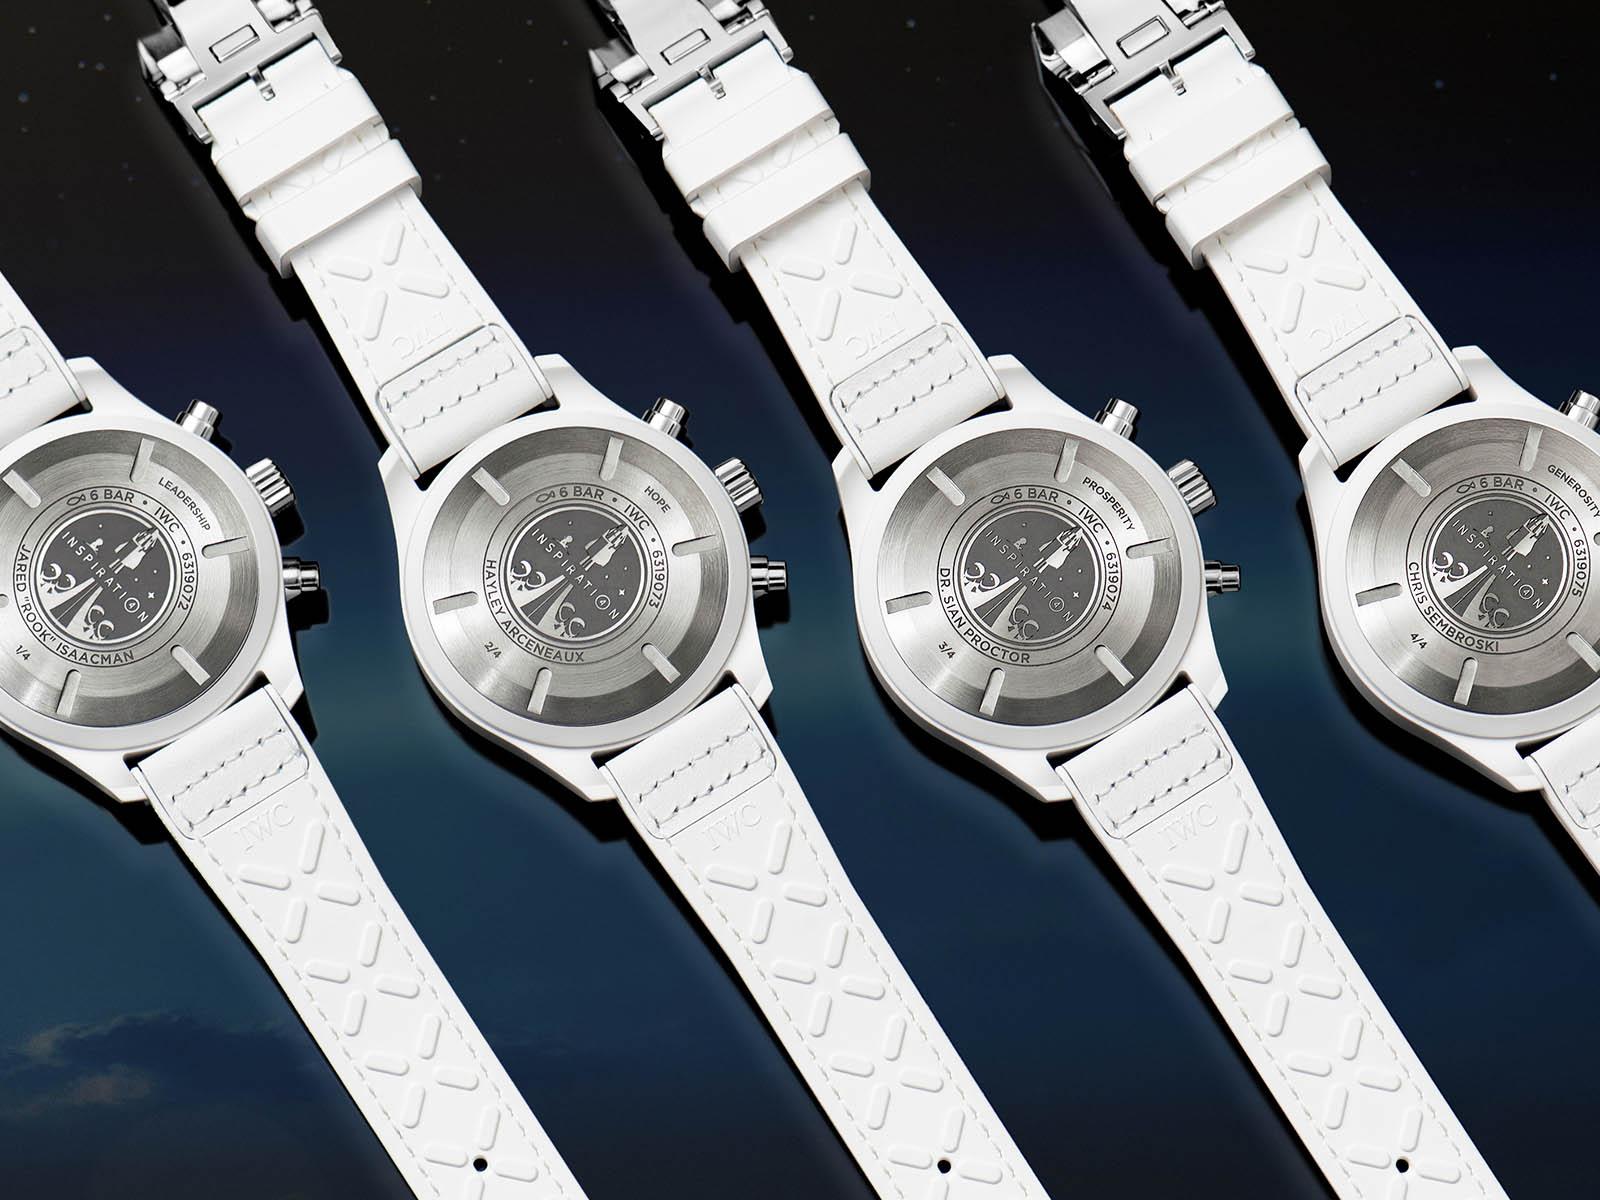 iw389110-iwc-pilot-s-watch-chronograph-edition-inspiration4-6.jpg